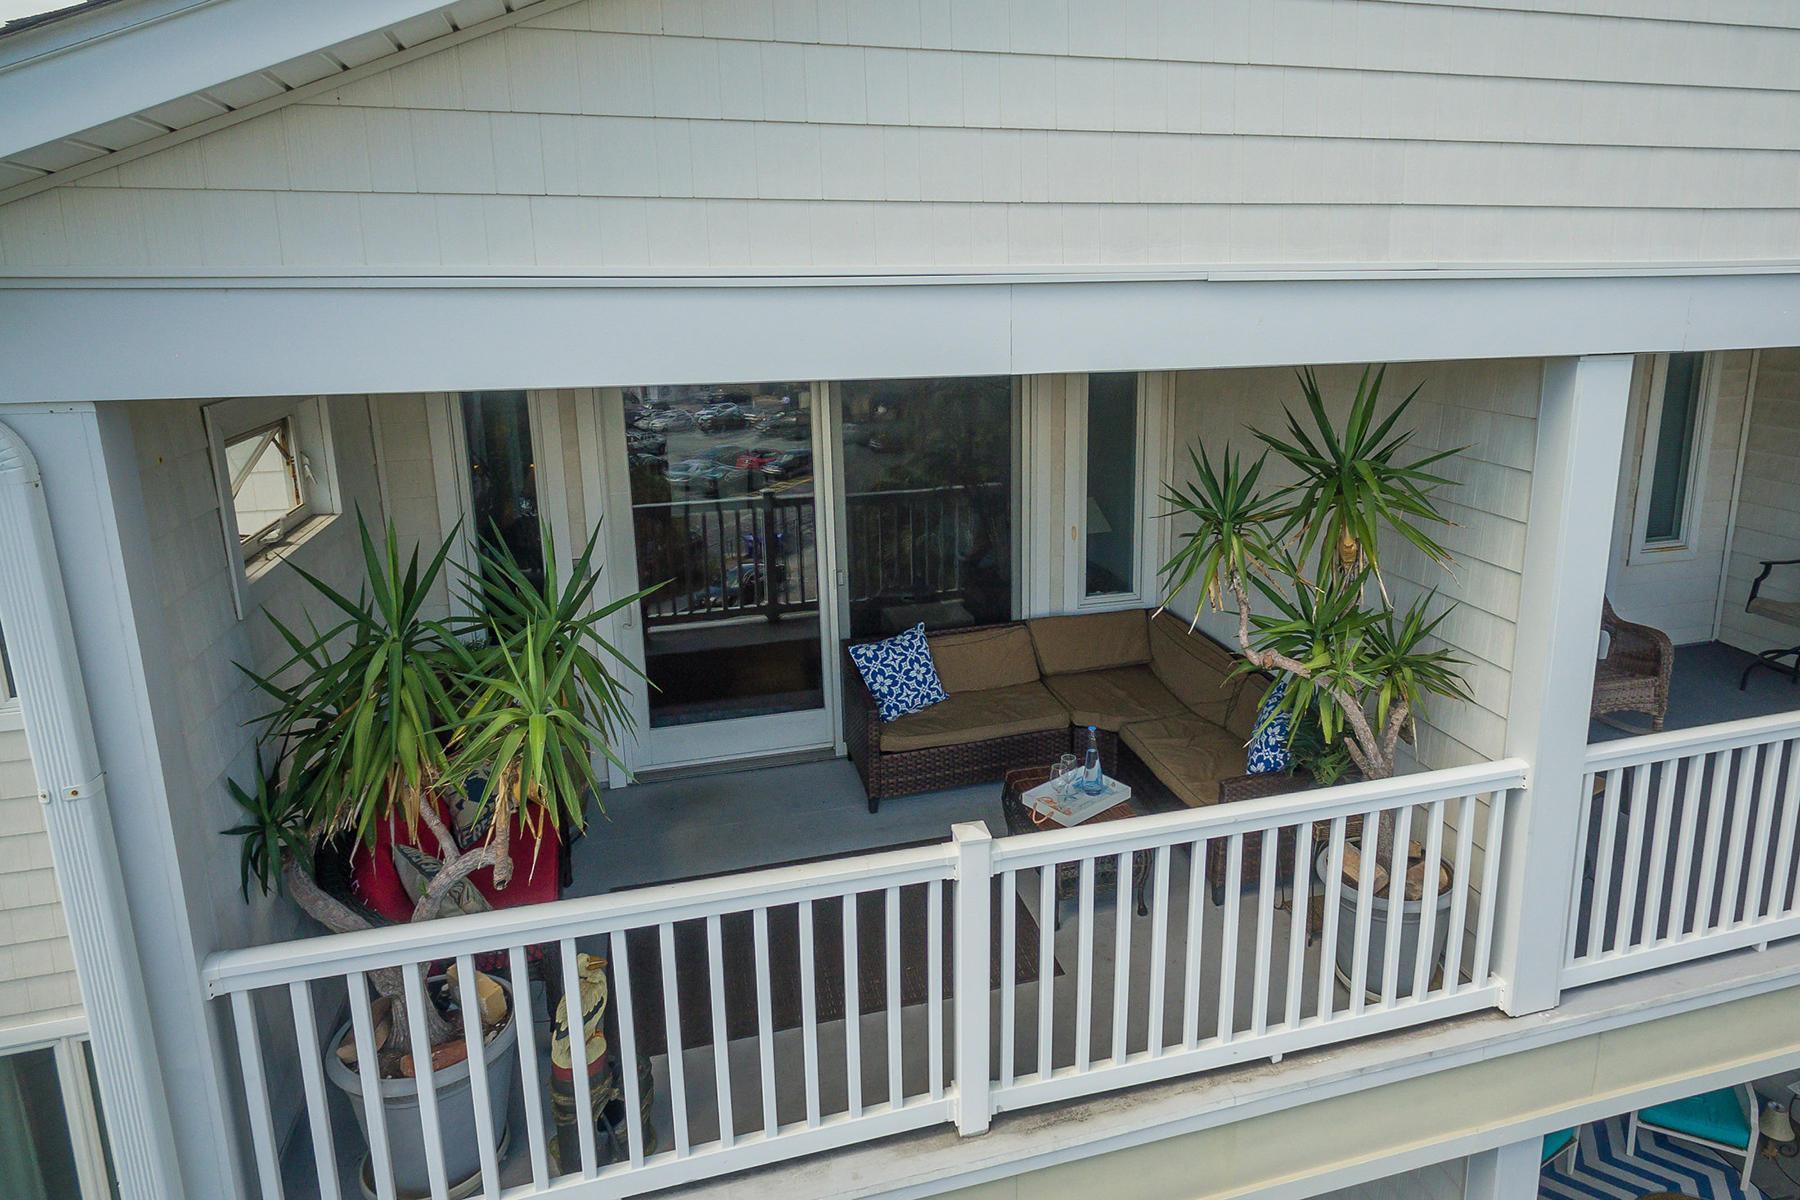 Pier Pointe Villas Homes For Sale - 114 Ashley, Folly Beach, SC - 5